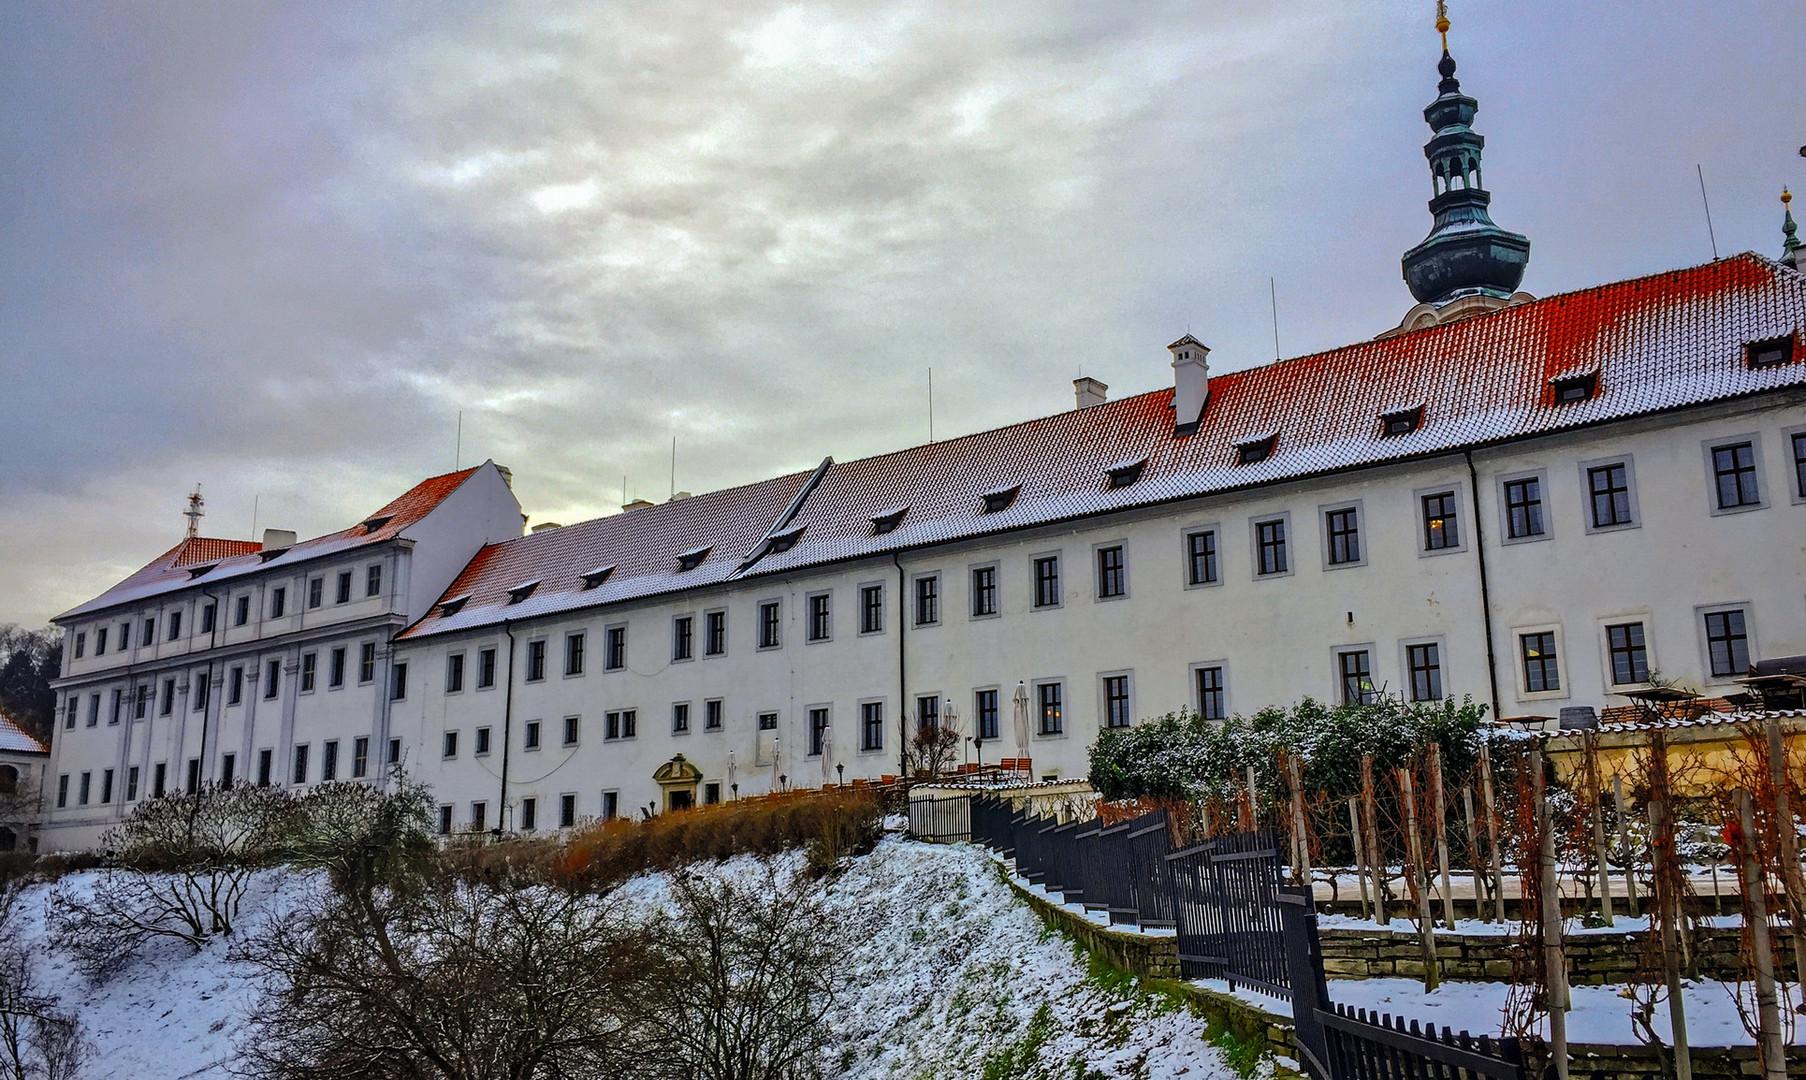 Страхов монастырь, Прага